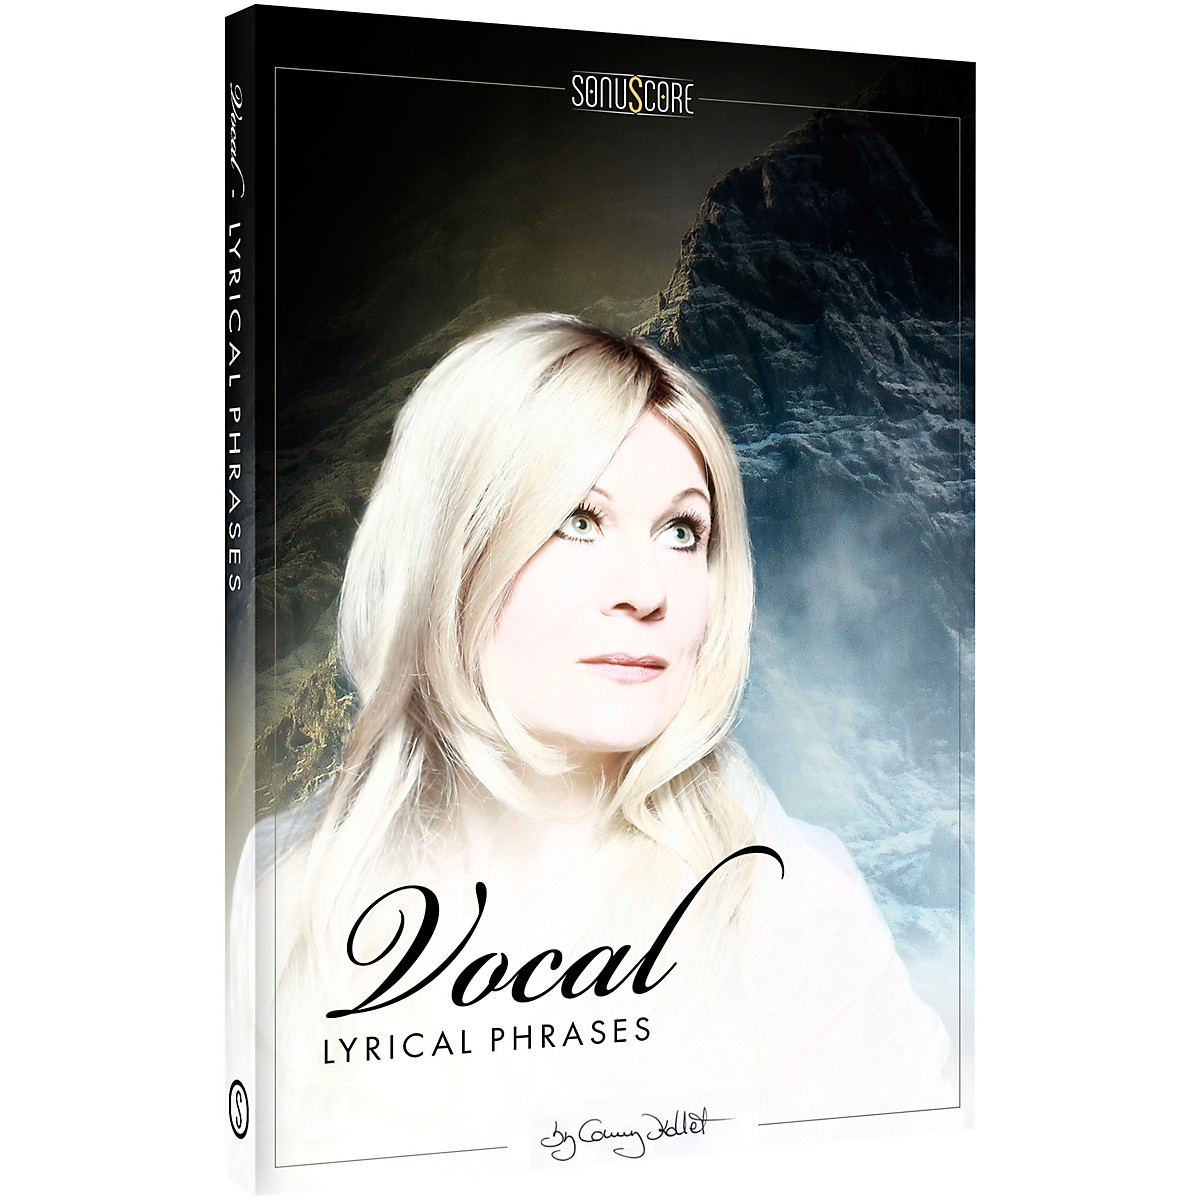 Sonuscore Lyrical Vocal Phrases